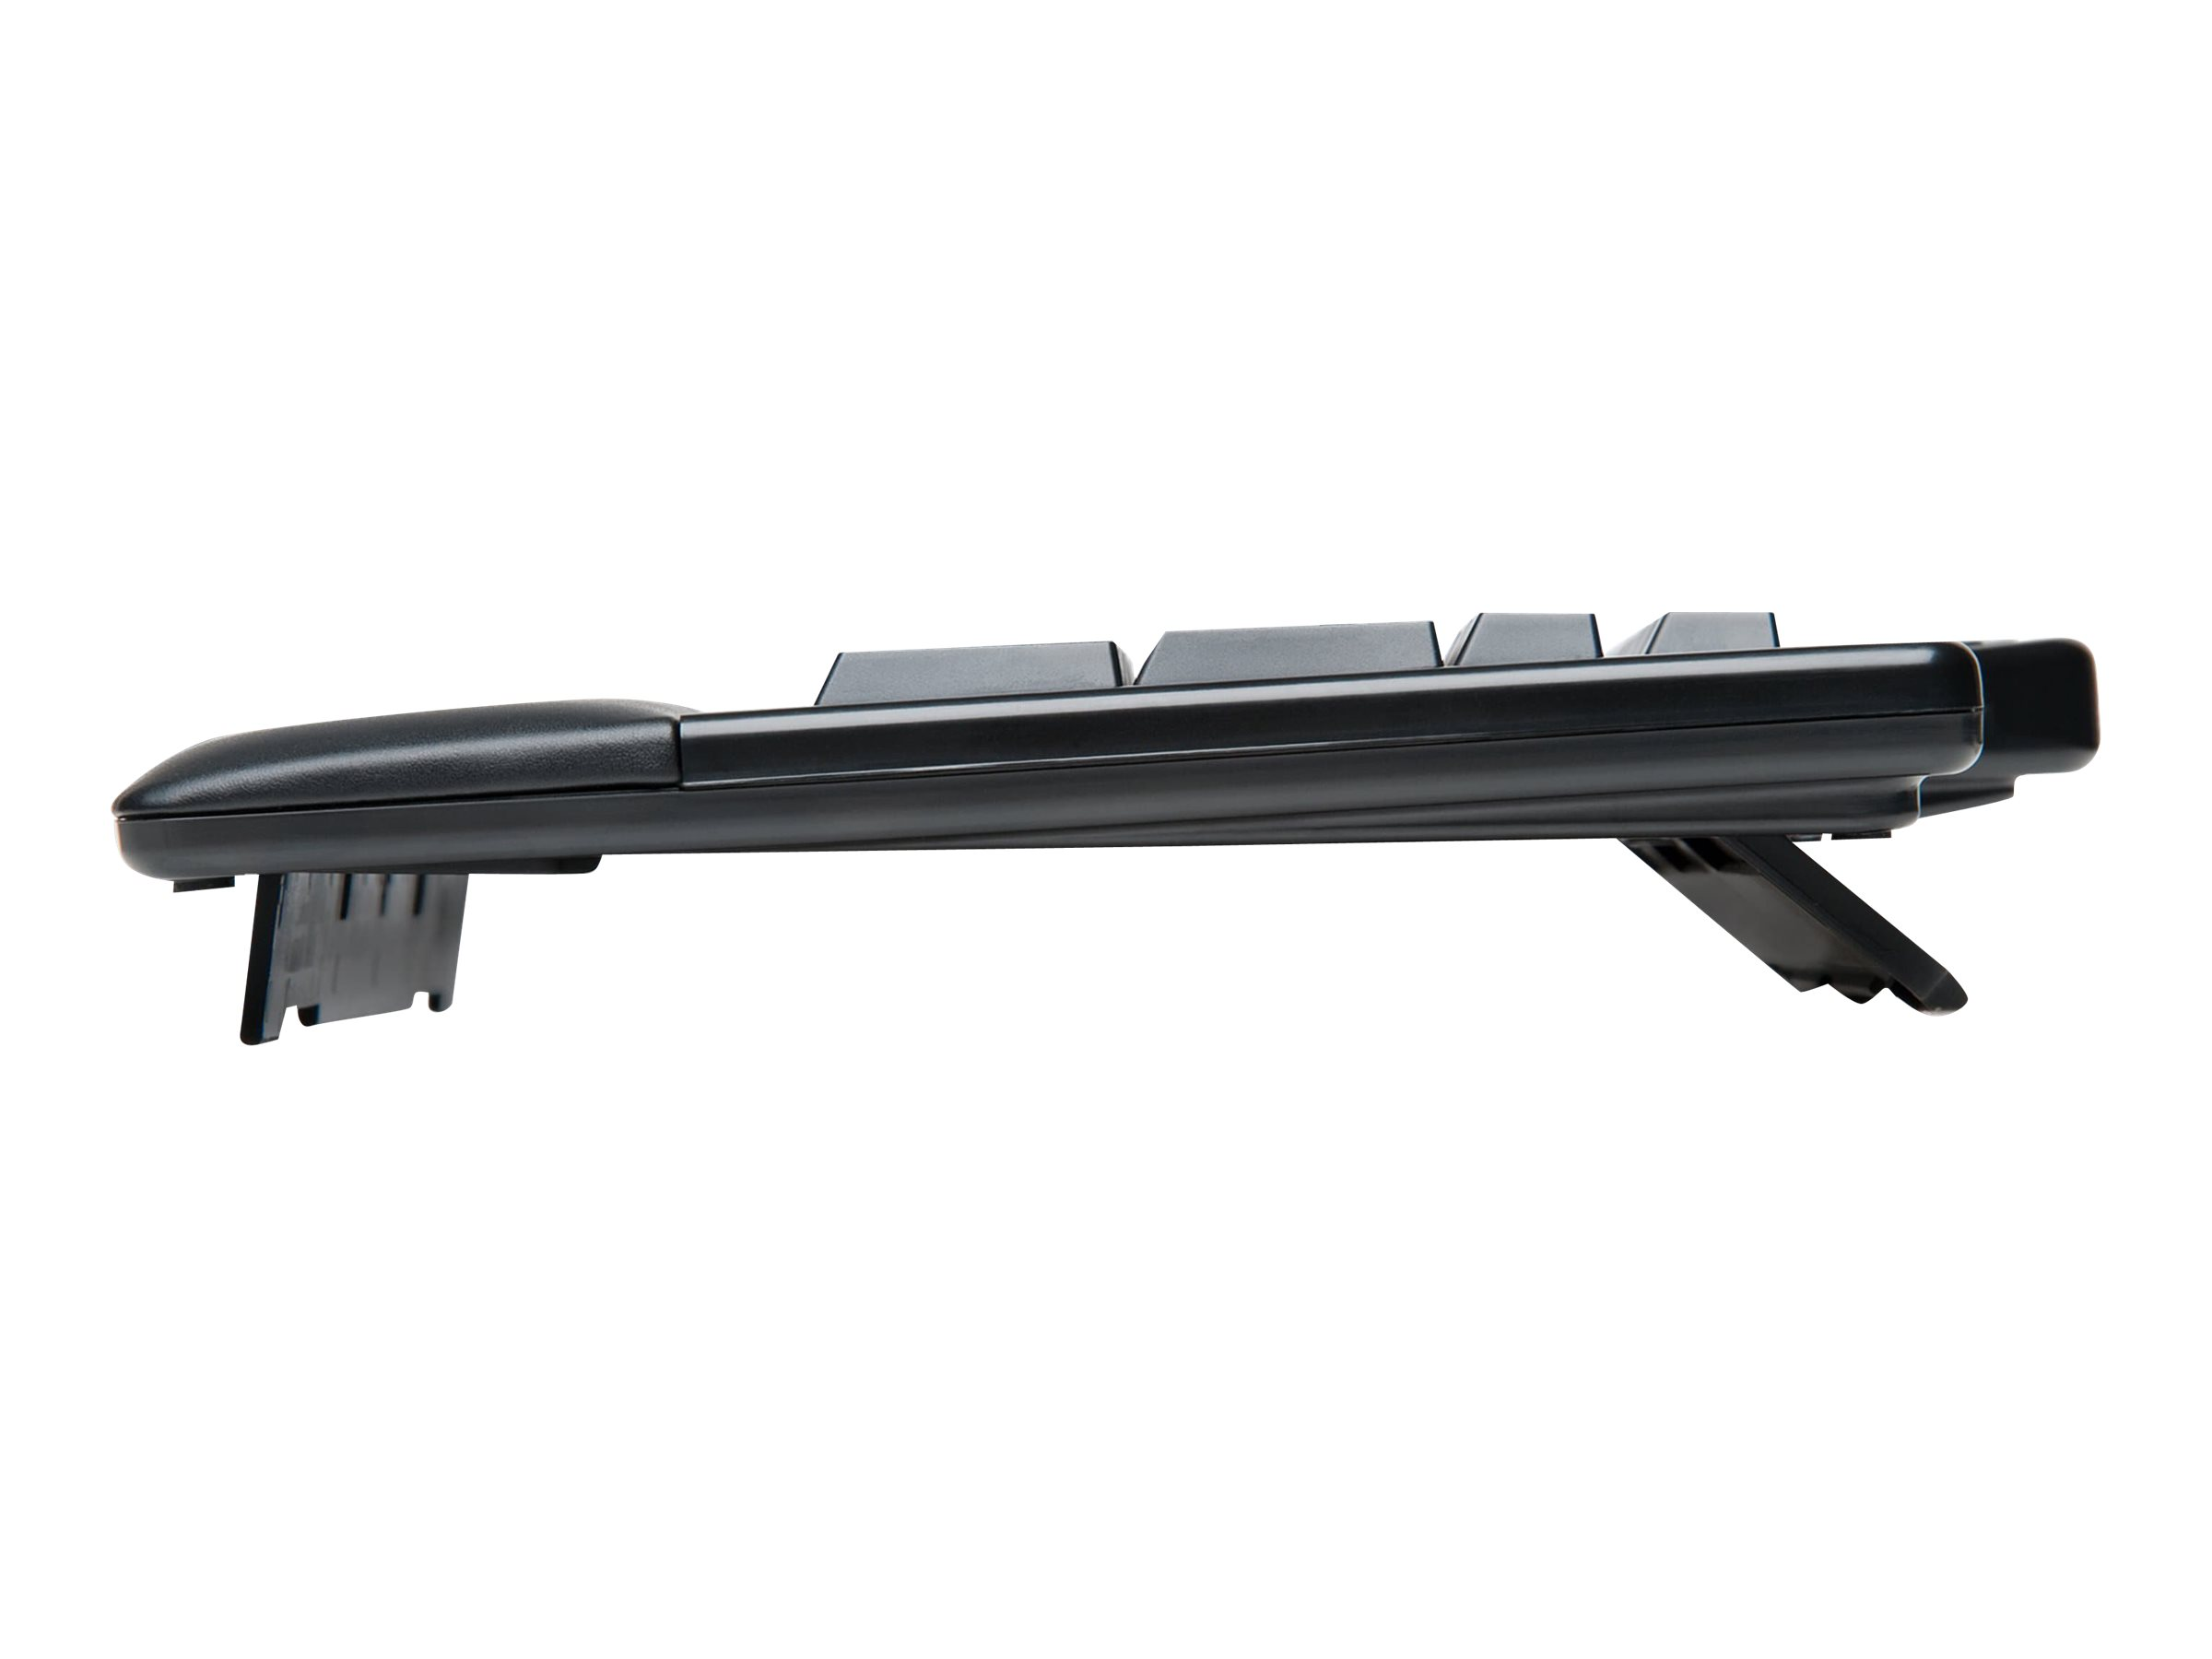 Kensington Pro Fit Wired Comfort - keyboard - US - black